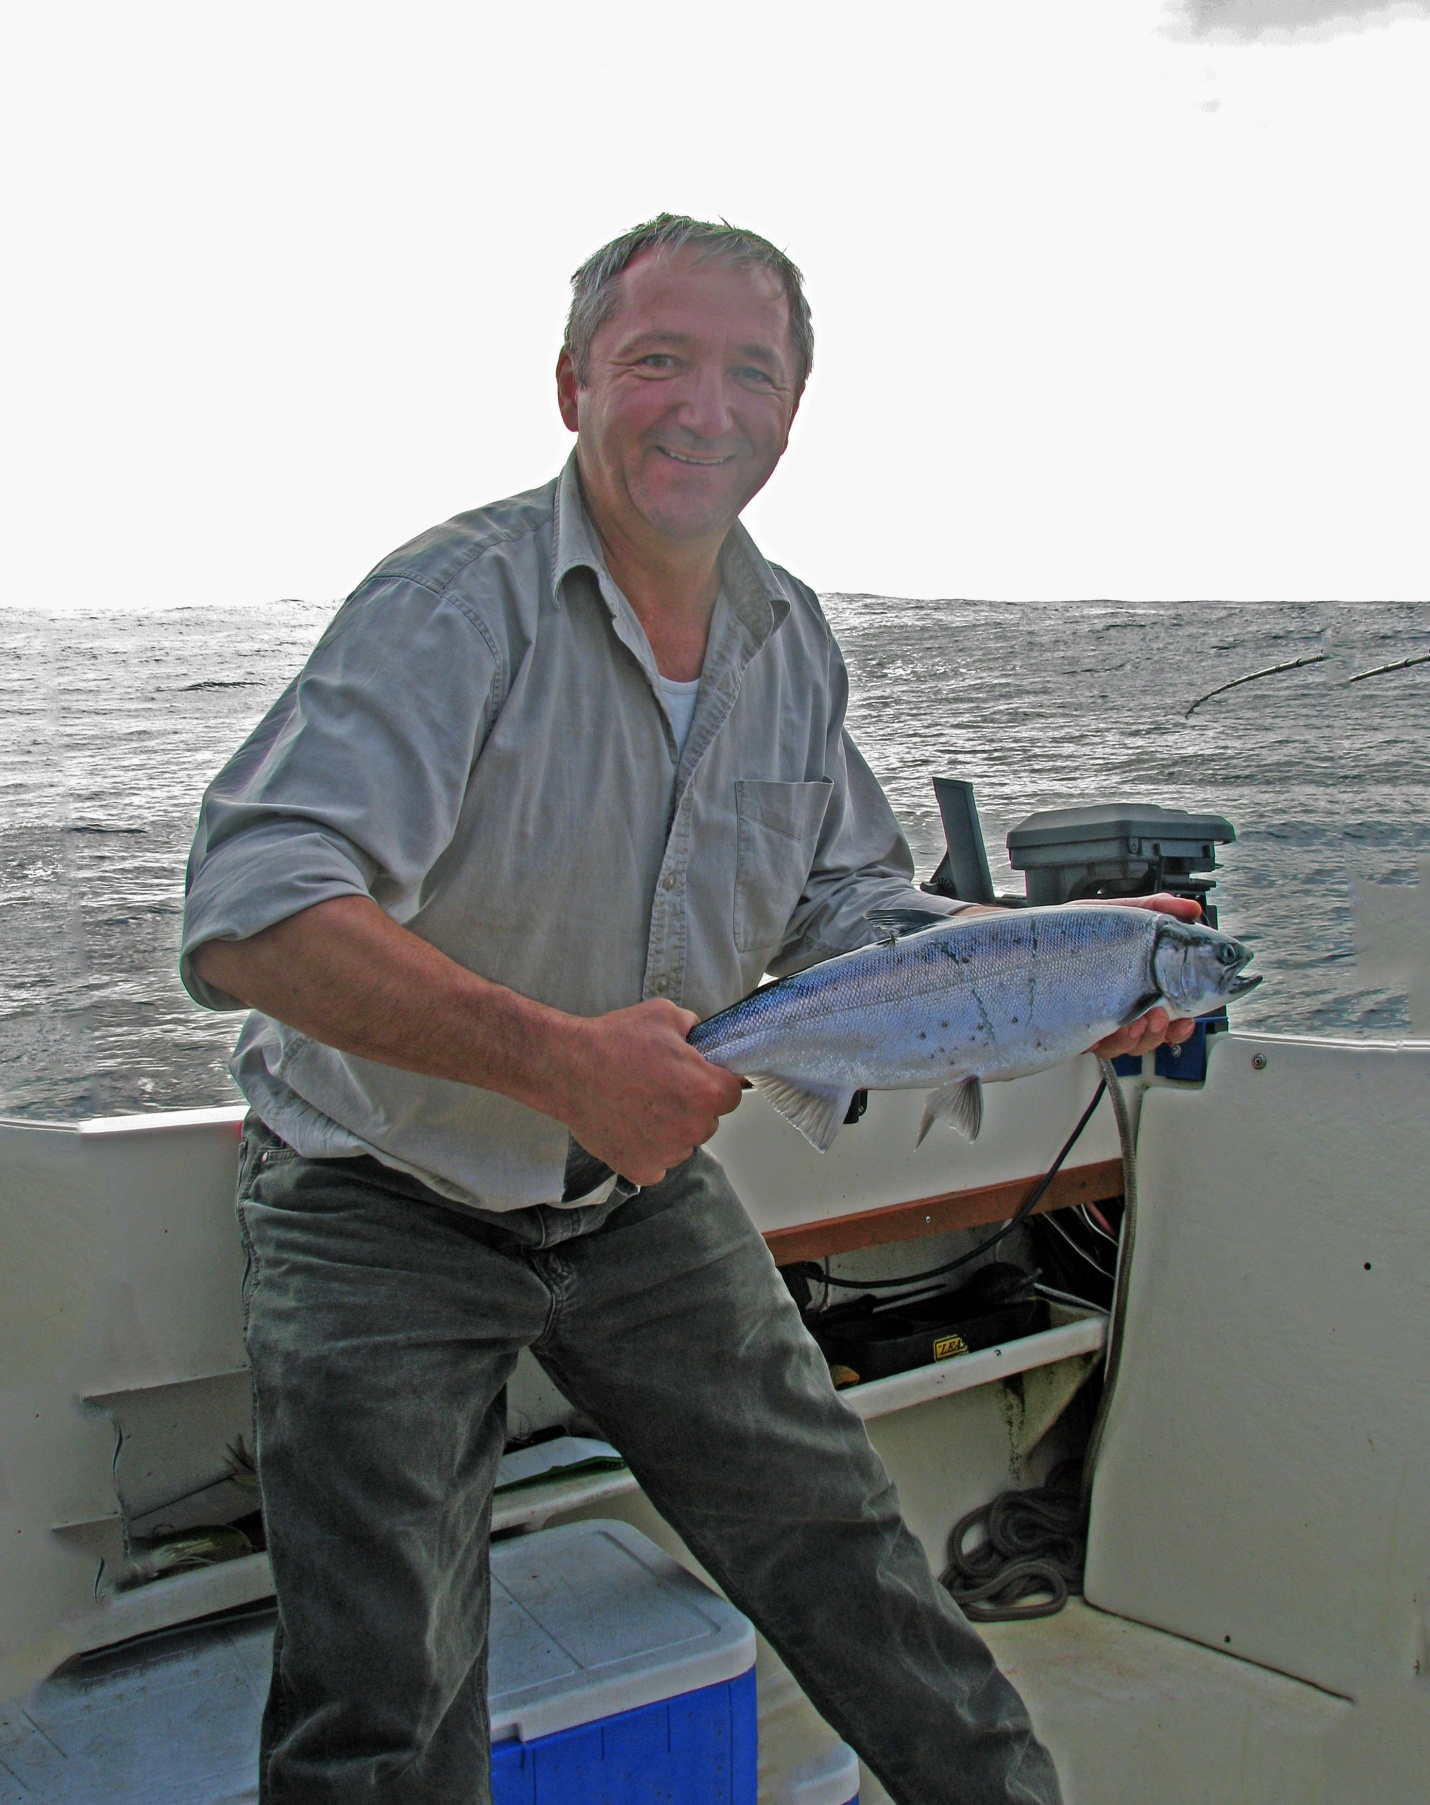 C:\Users\Russ\Desktop\Fishing\Fishing 034.jpg